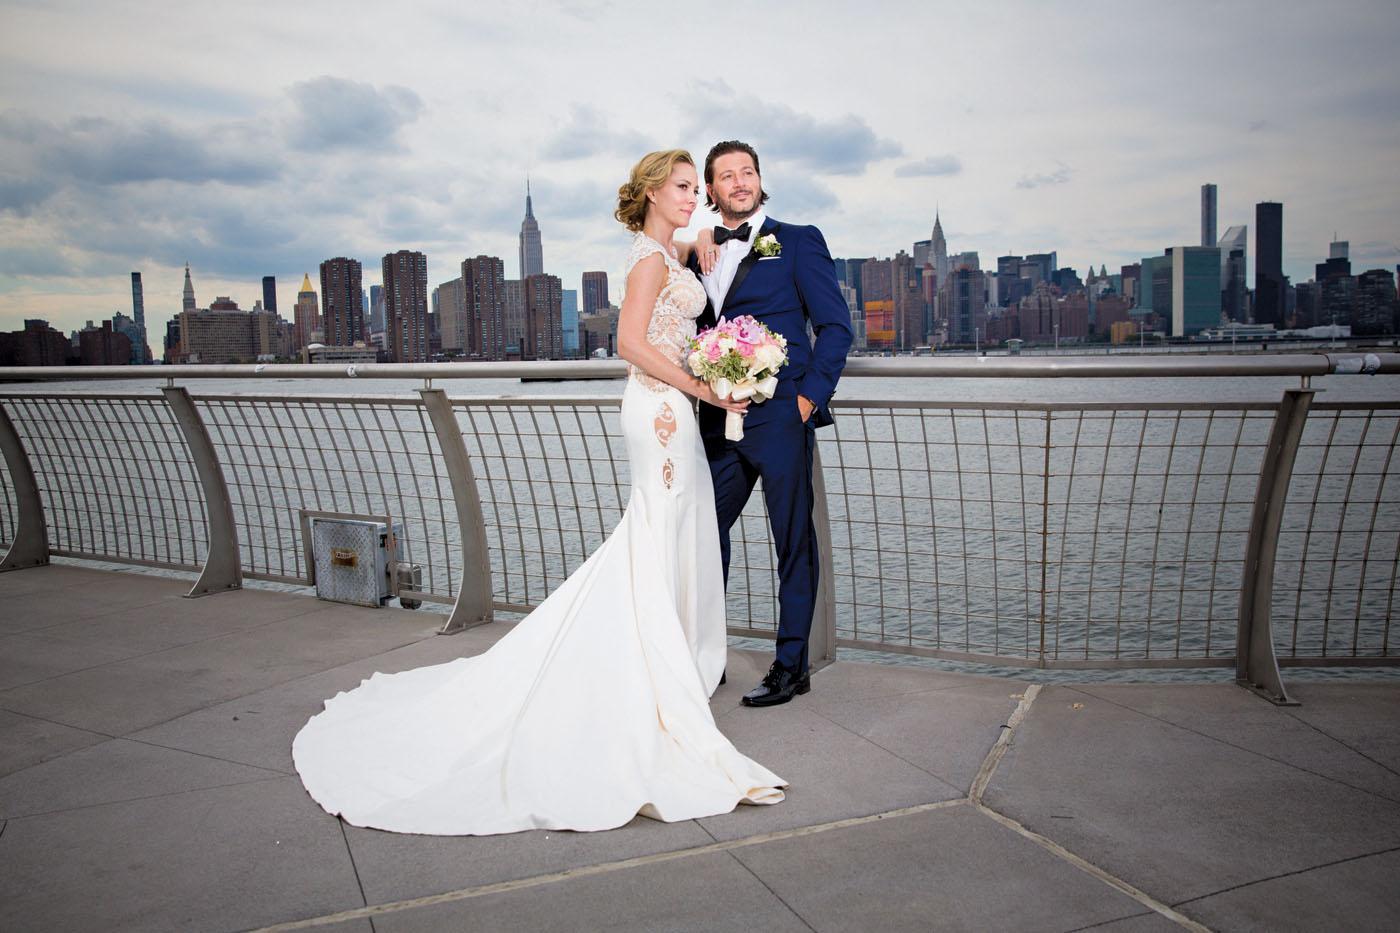 Harmony David S Wedding At The Vanderbilt South Beach Visual Image Video Photography